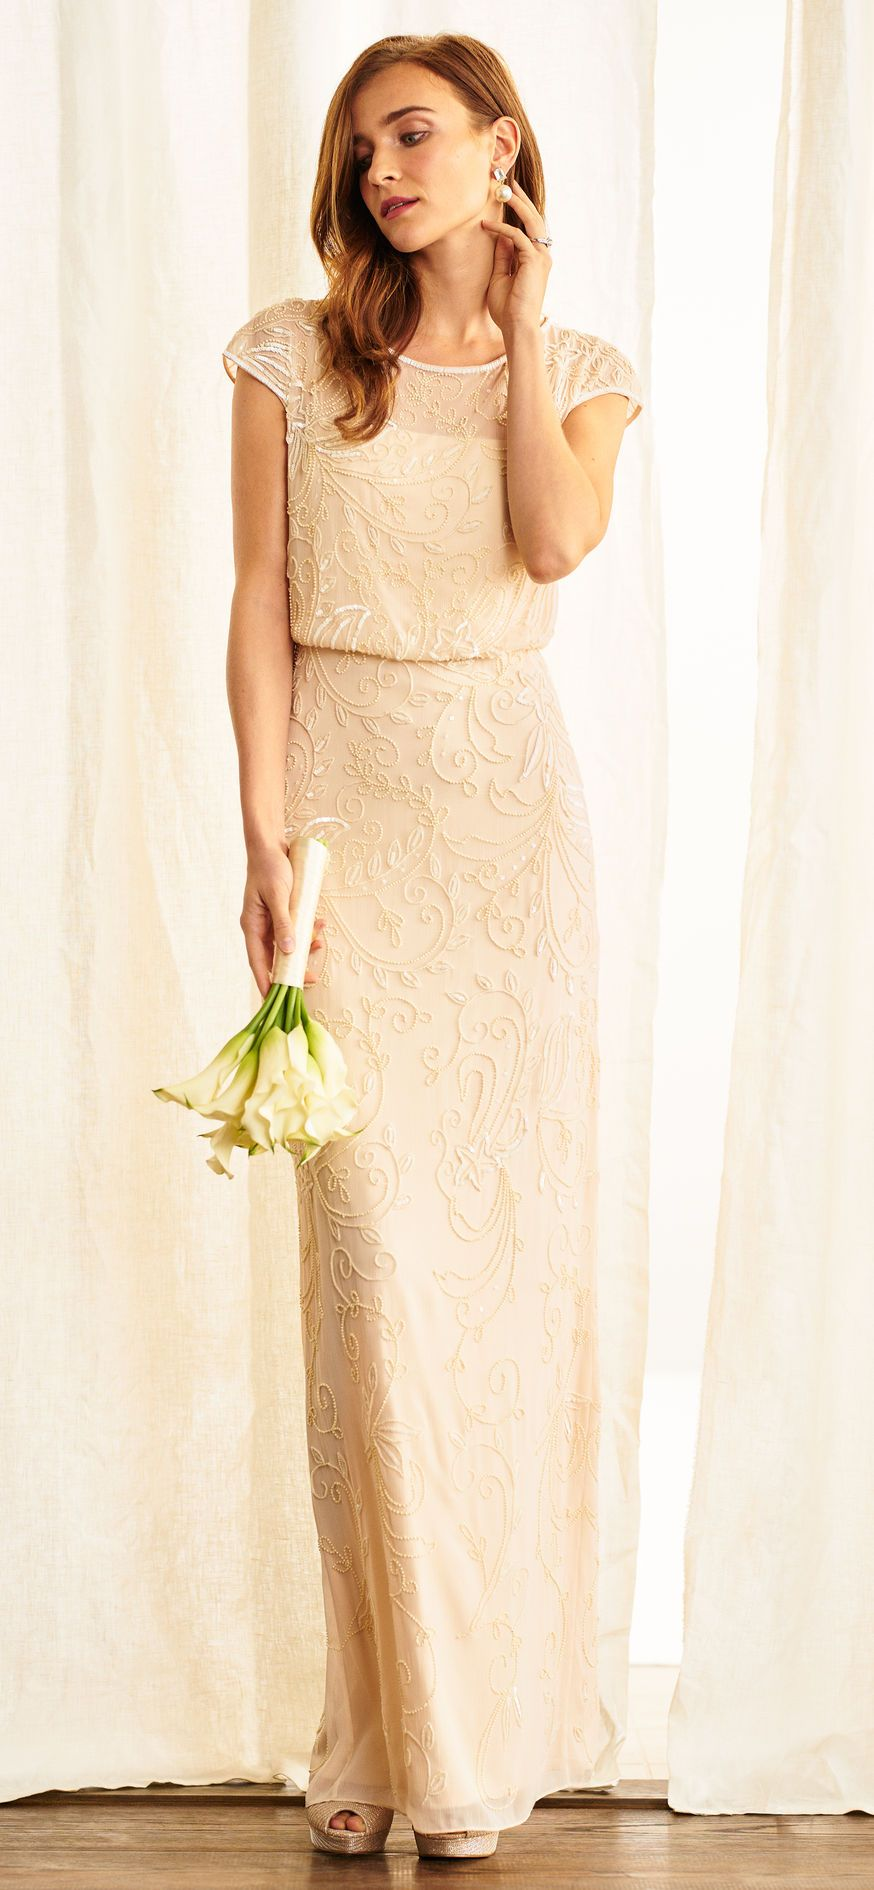 Cap sleeve beaded blouson dress with sheer neckline wedding dress